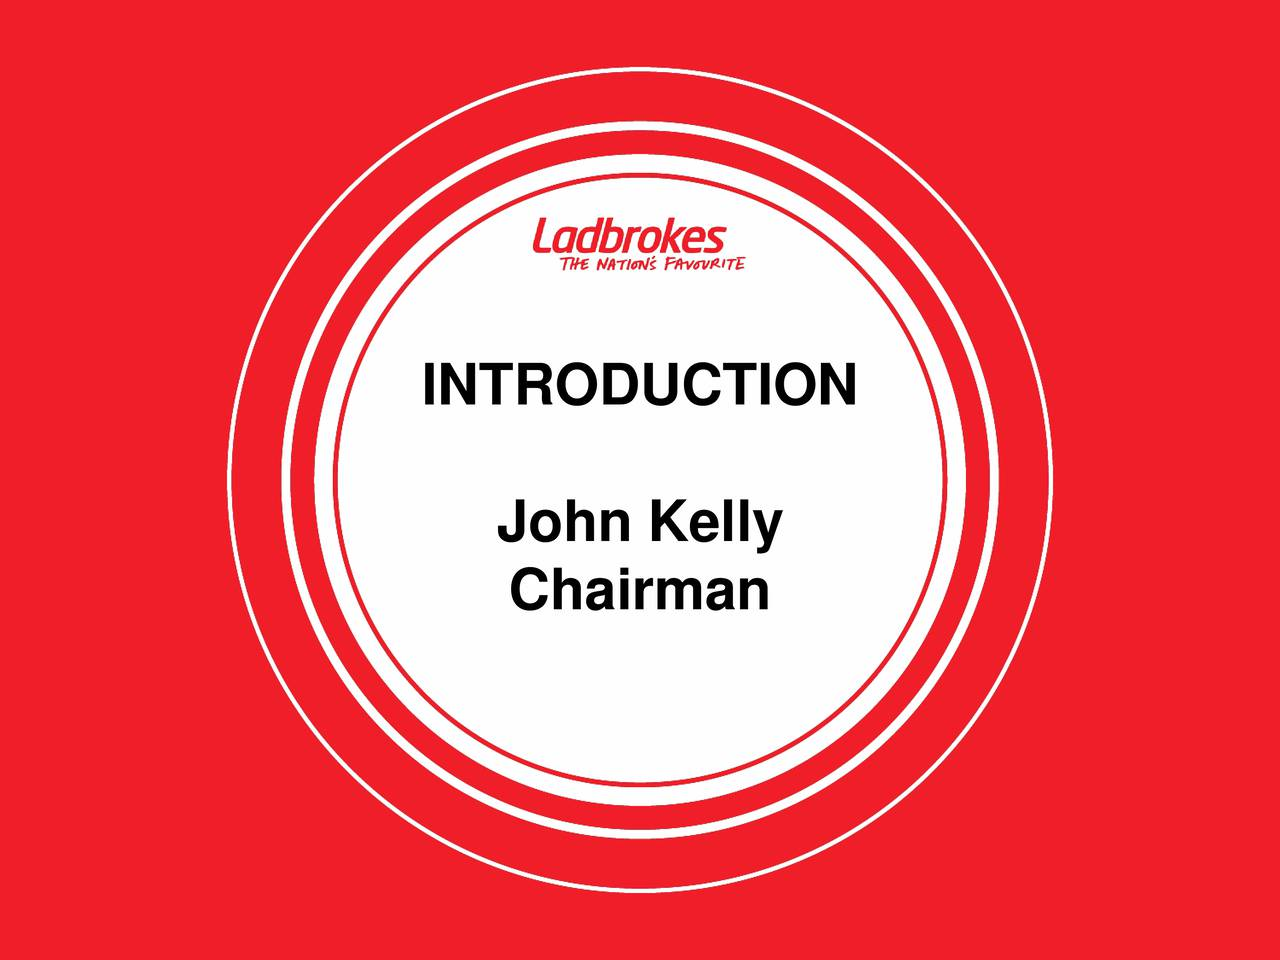 John Kelly Chairman